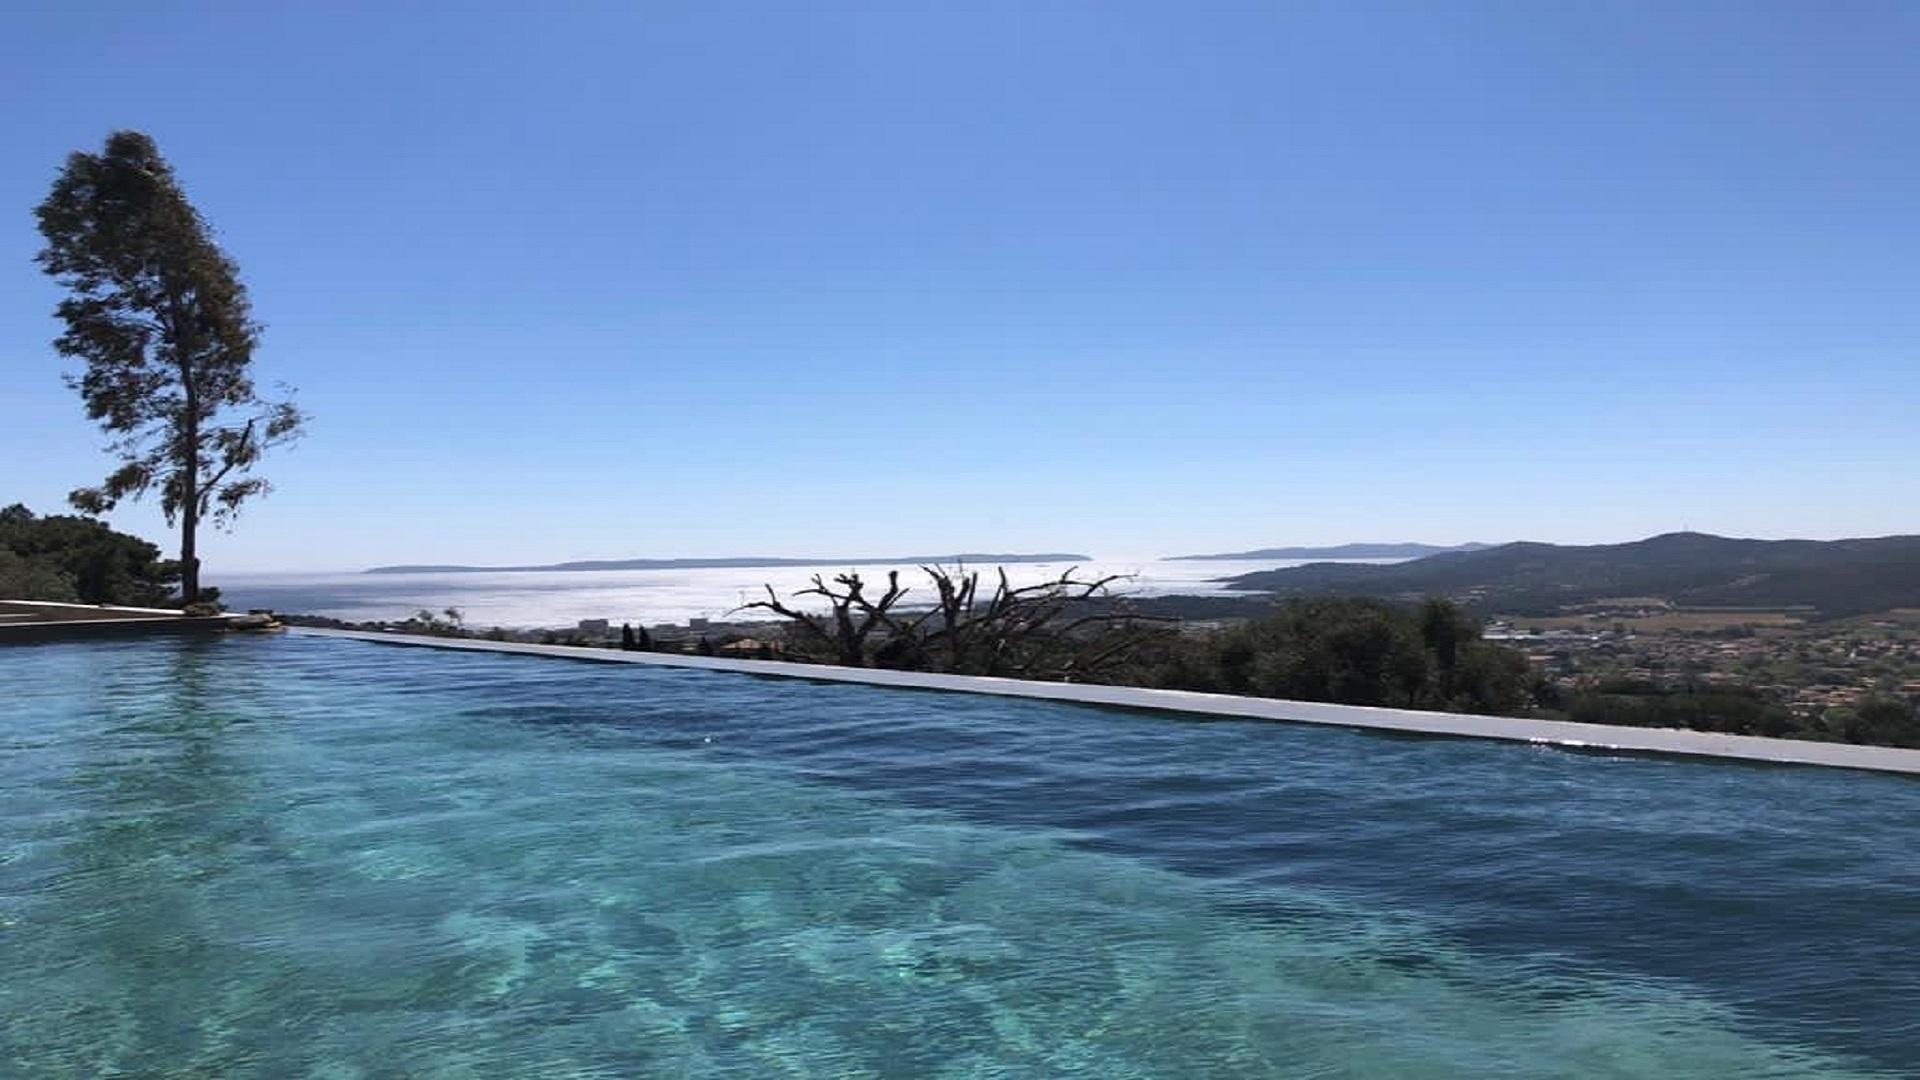 eden-rose-grand-hotel-bormes-les-mimosas-paca-cote-azur-piscine-seminaire